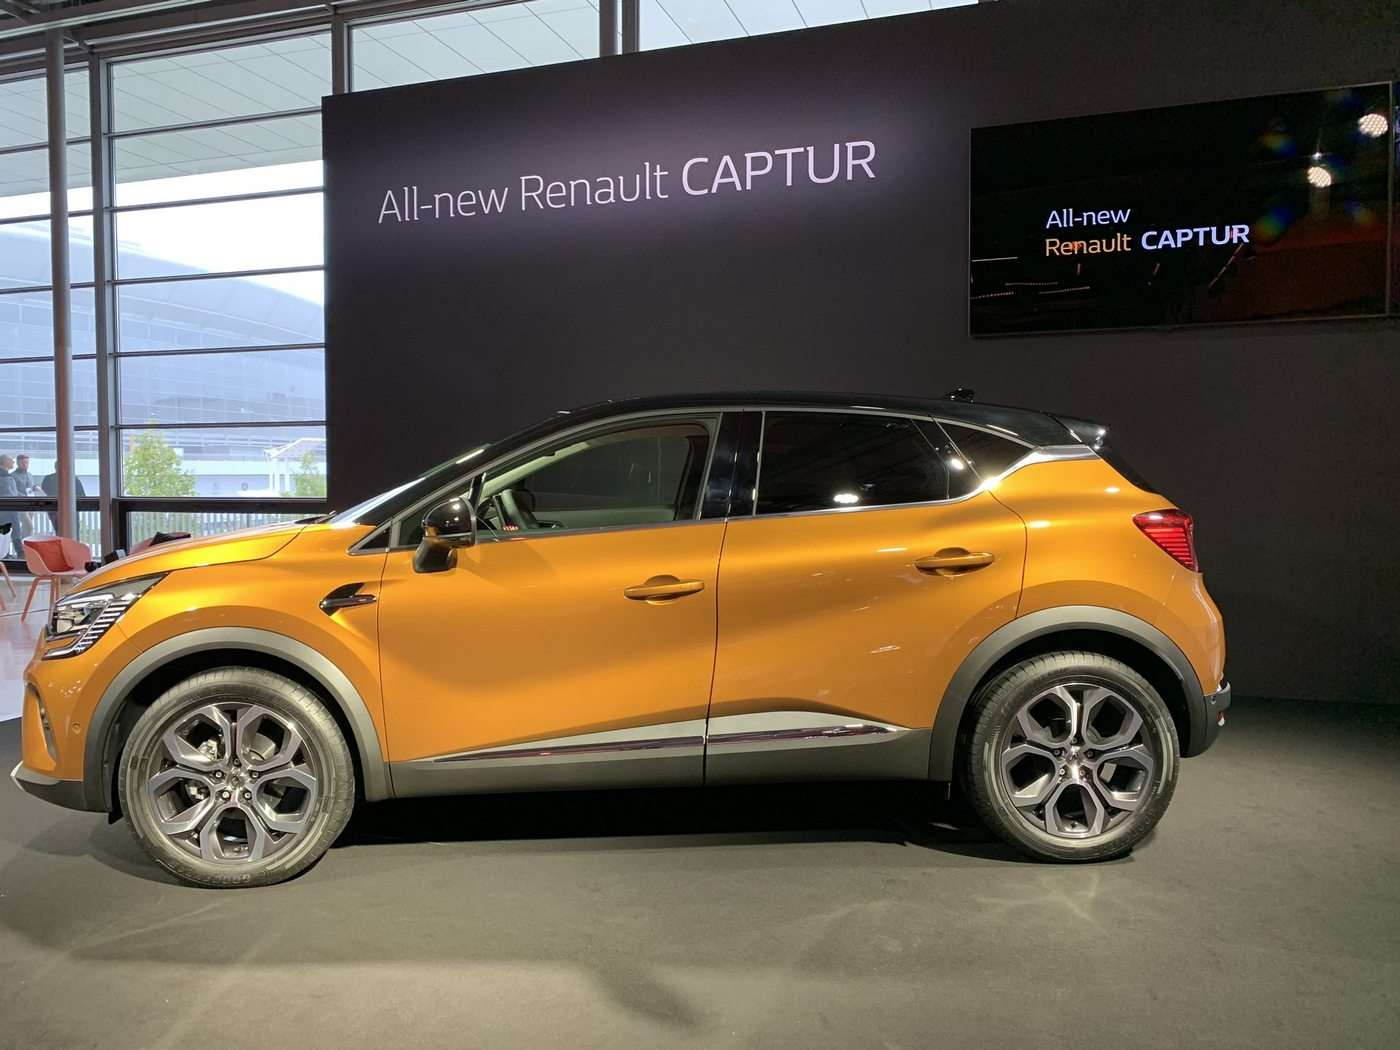 Salon de Francfort 2019 : Renault en catimini avec le Captur hybride E-Tech Plug-in